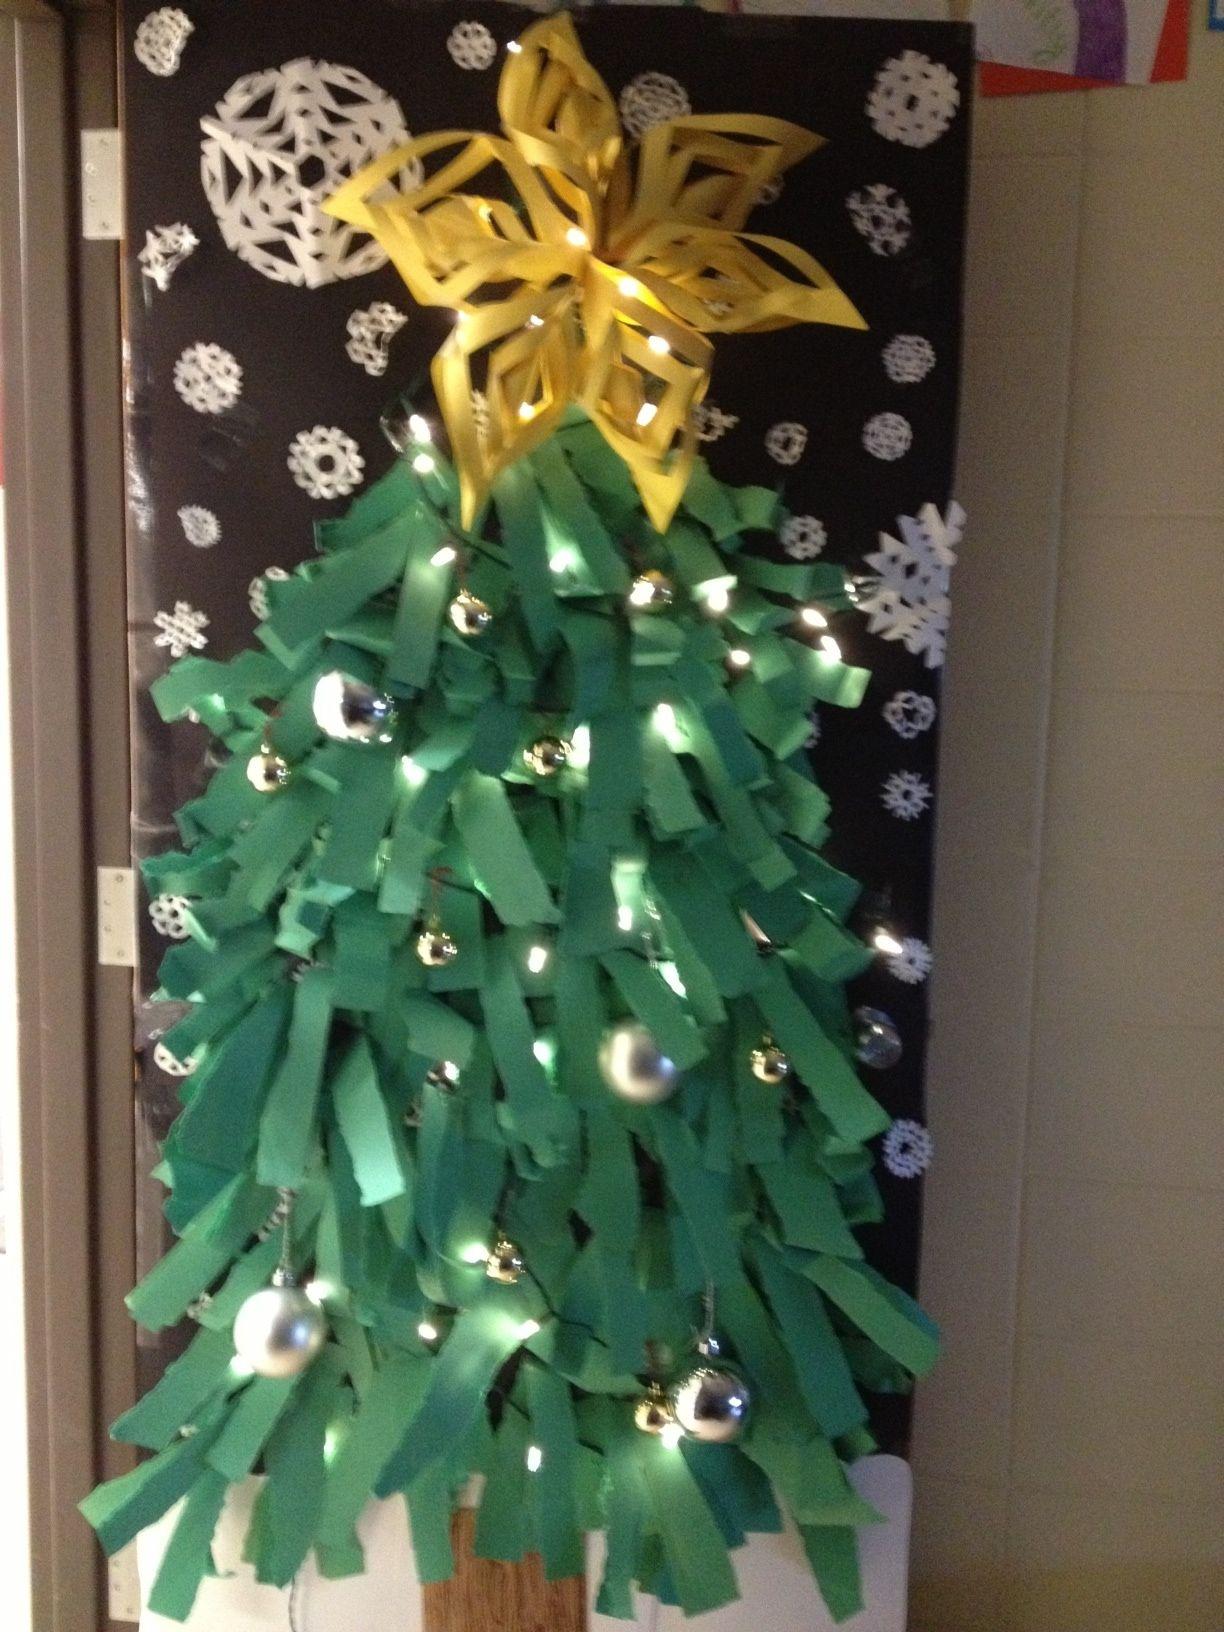 Christmas tree door decoration - Christmas Tree Classroom Door Decorations Photo 9